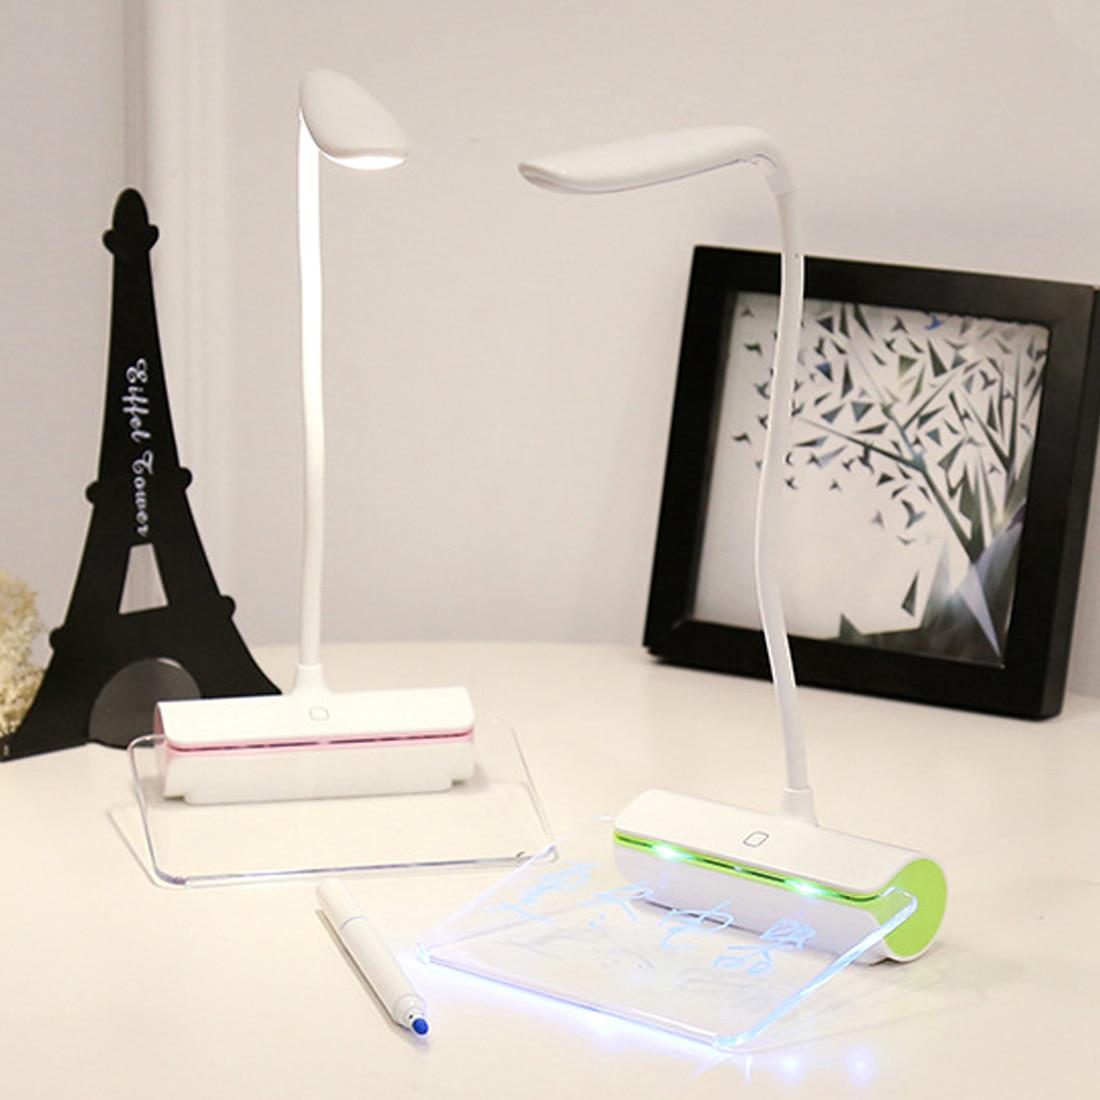 2019 Mode Oplaadbare Tafellamp Led Light Switch Usb Opladen Tl Message Board Touch 3 Niveau Licht Verstelbare Nachtlampje 1.5 W Voldoende Aanbod